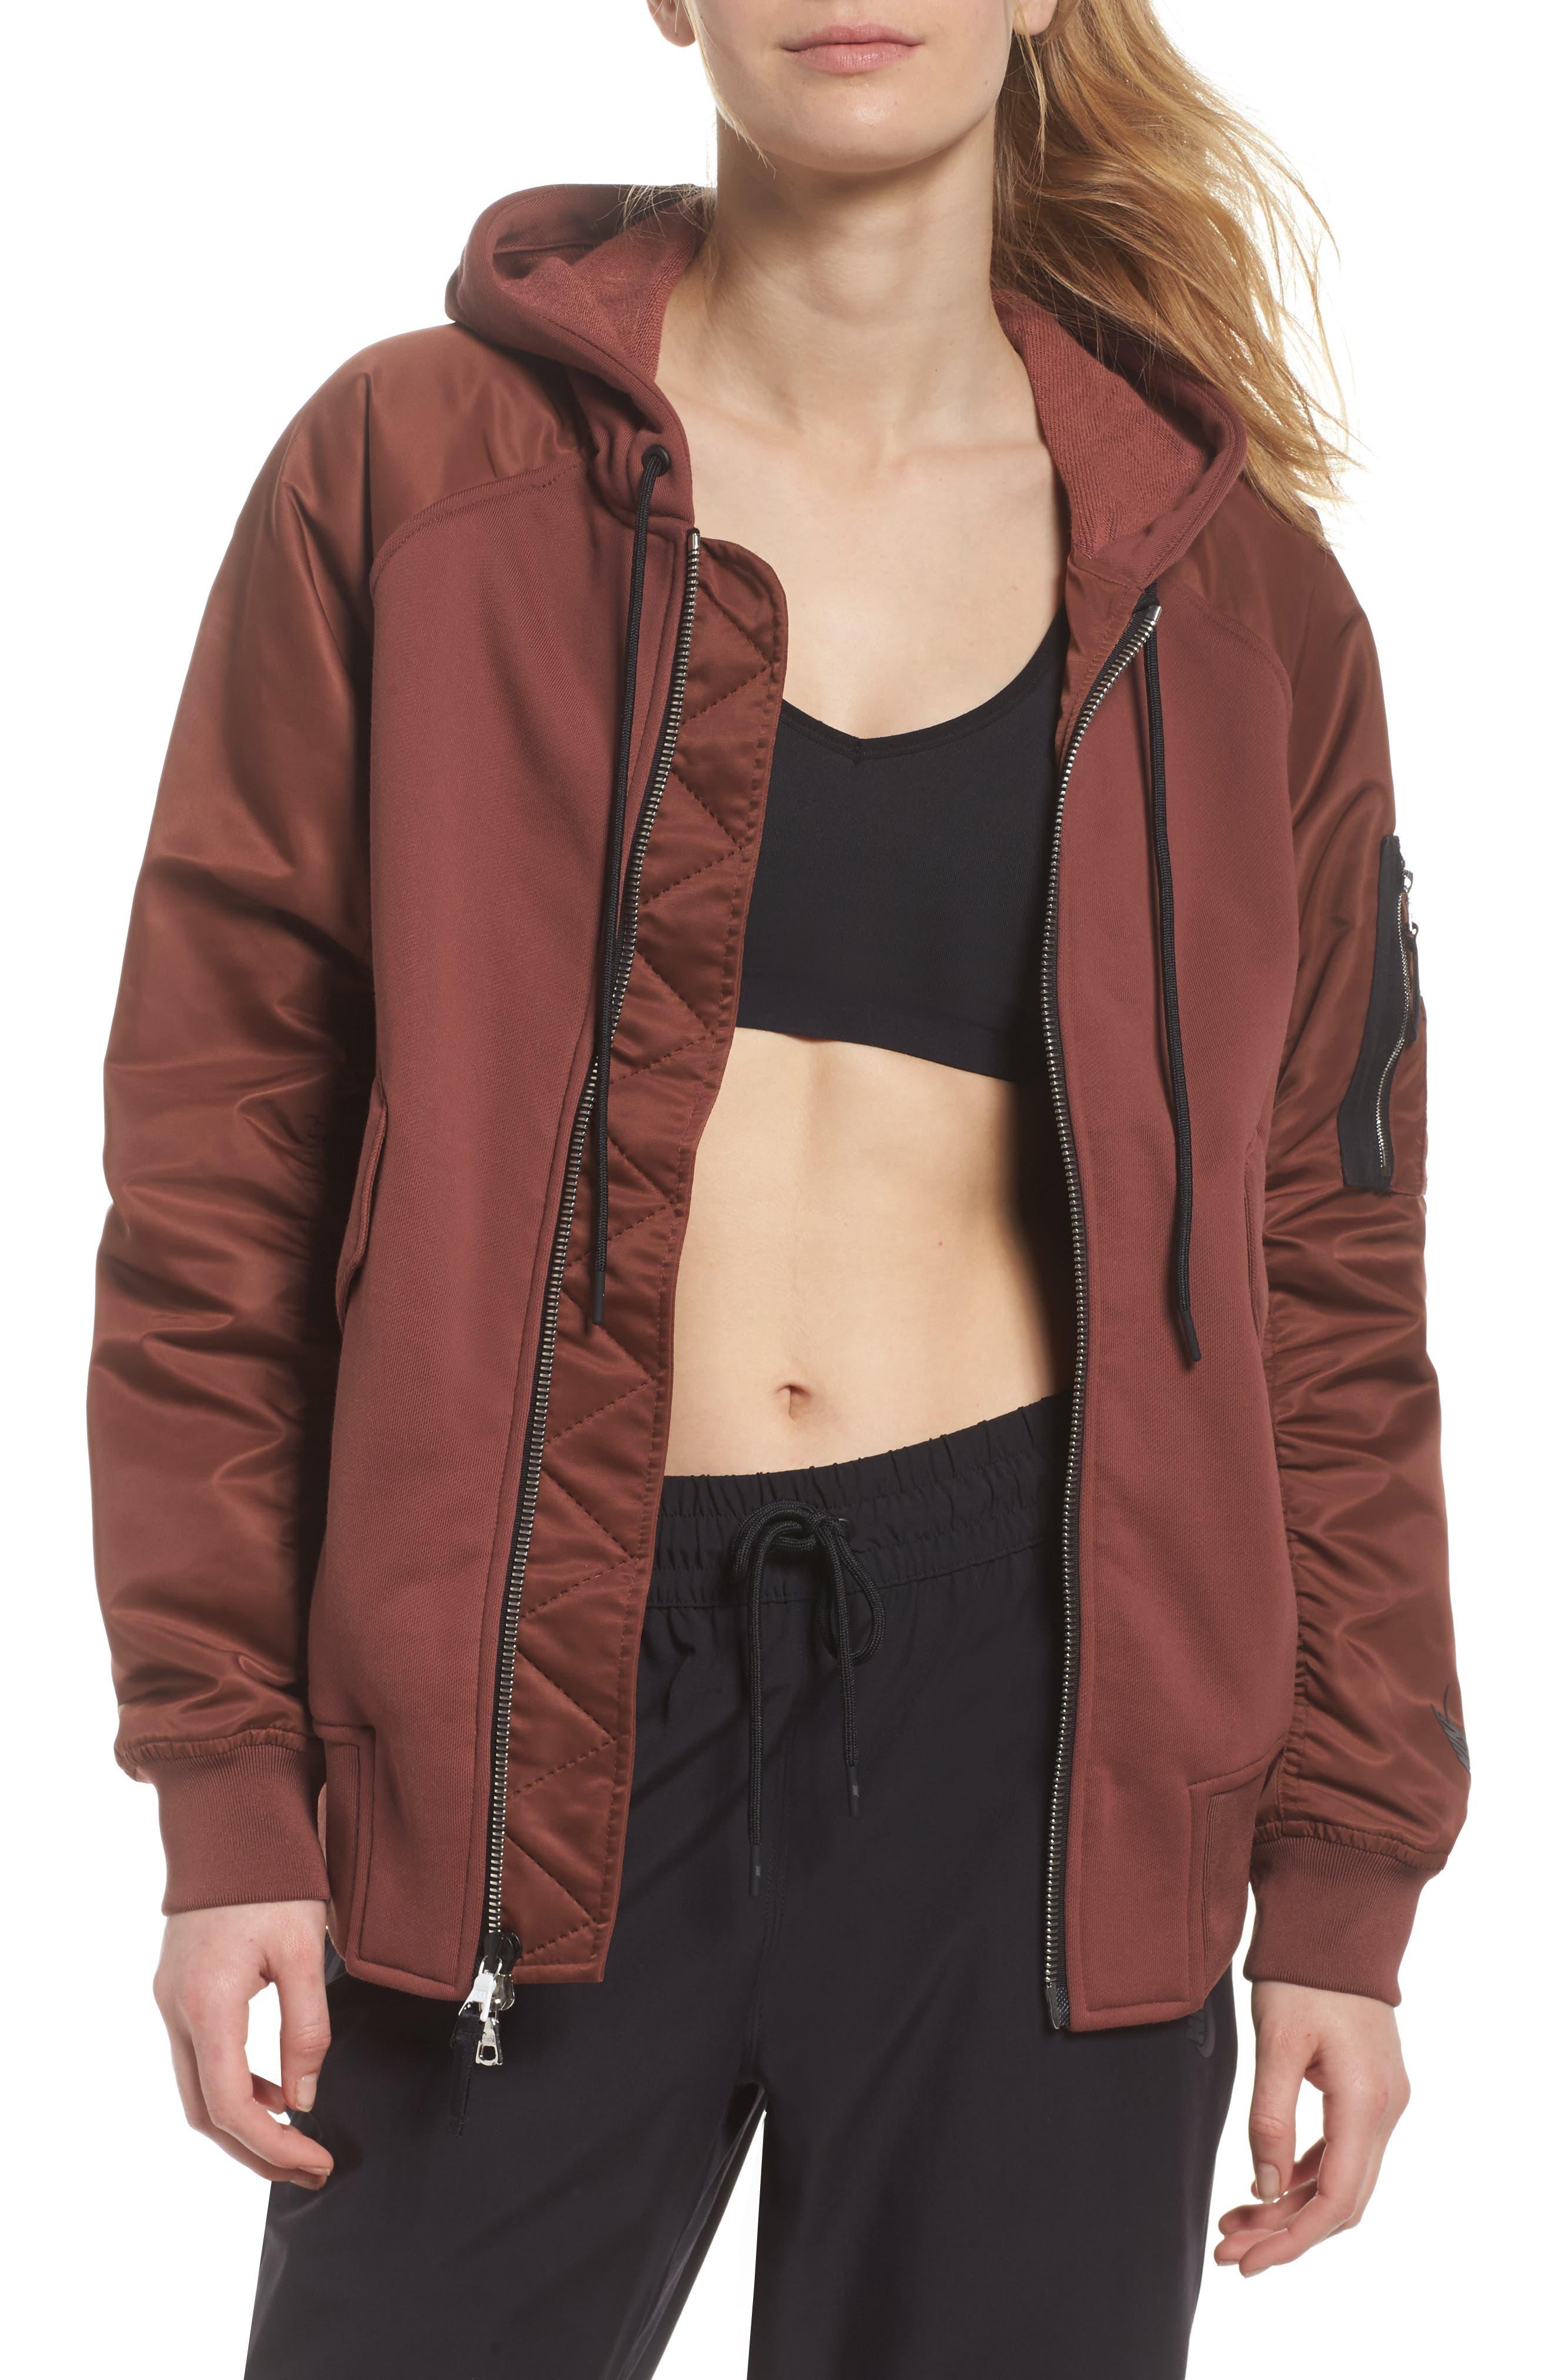 NikeLab Women's Mixed Media Bomber Jacket,                             Main thumbnail 2, color,